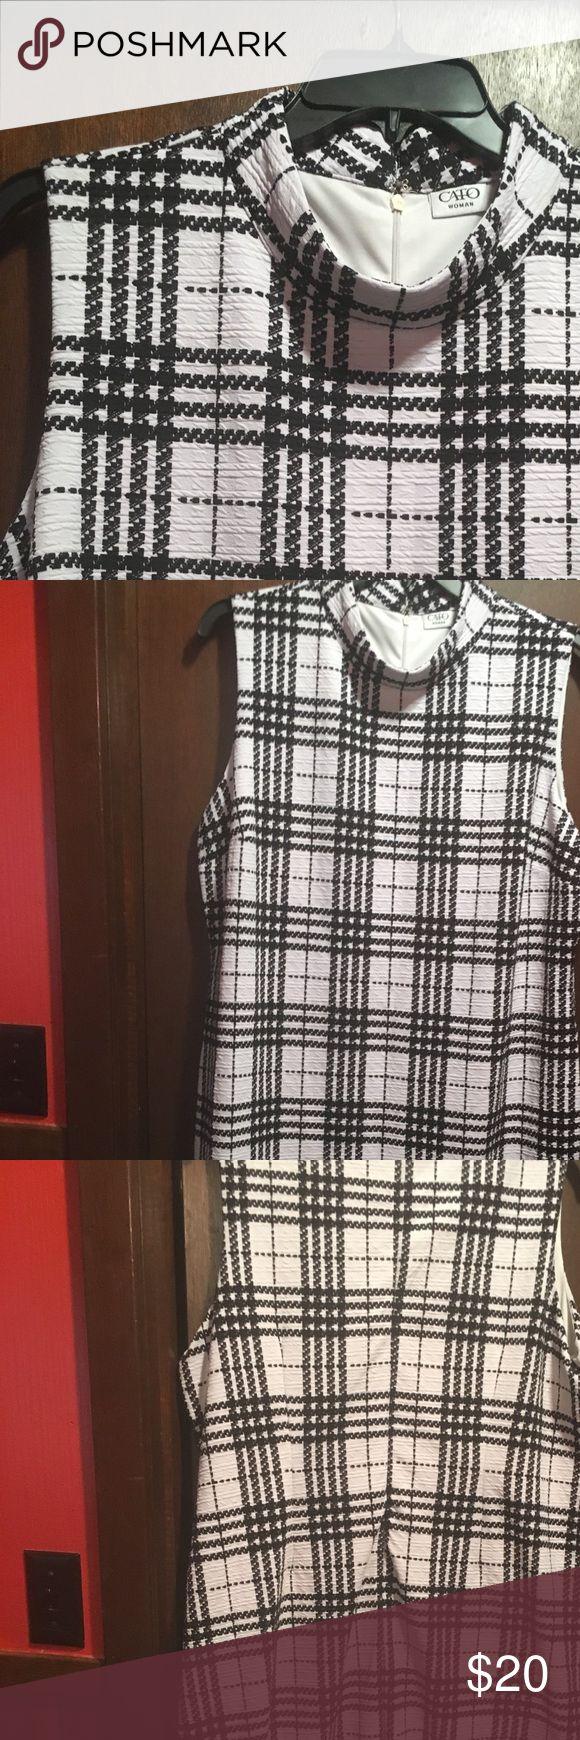 Size 22/24 striped dress Size 22/24 sleeveless dress. Knee length. Mock neck. Black/white stripe Dresses Midi